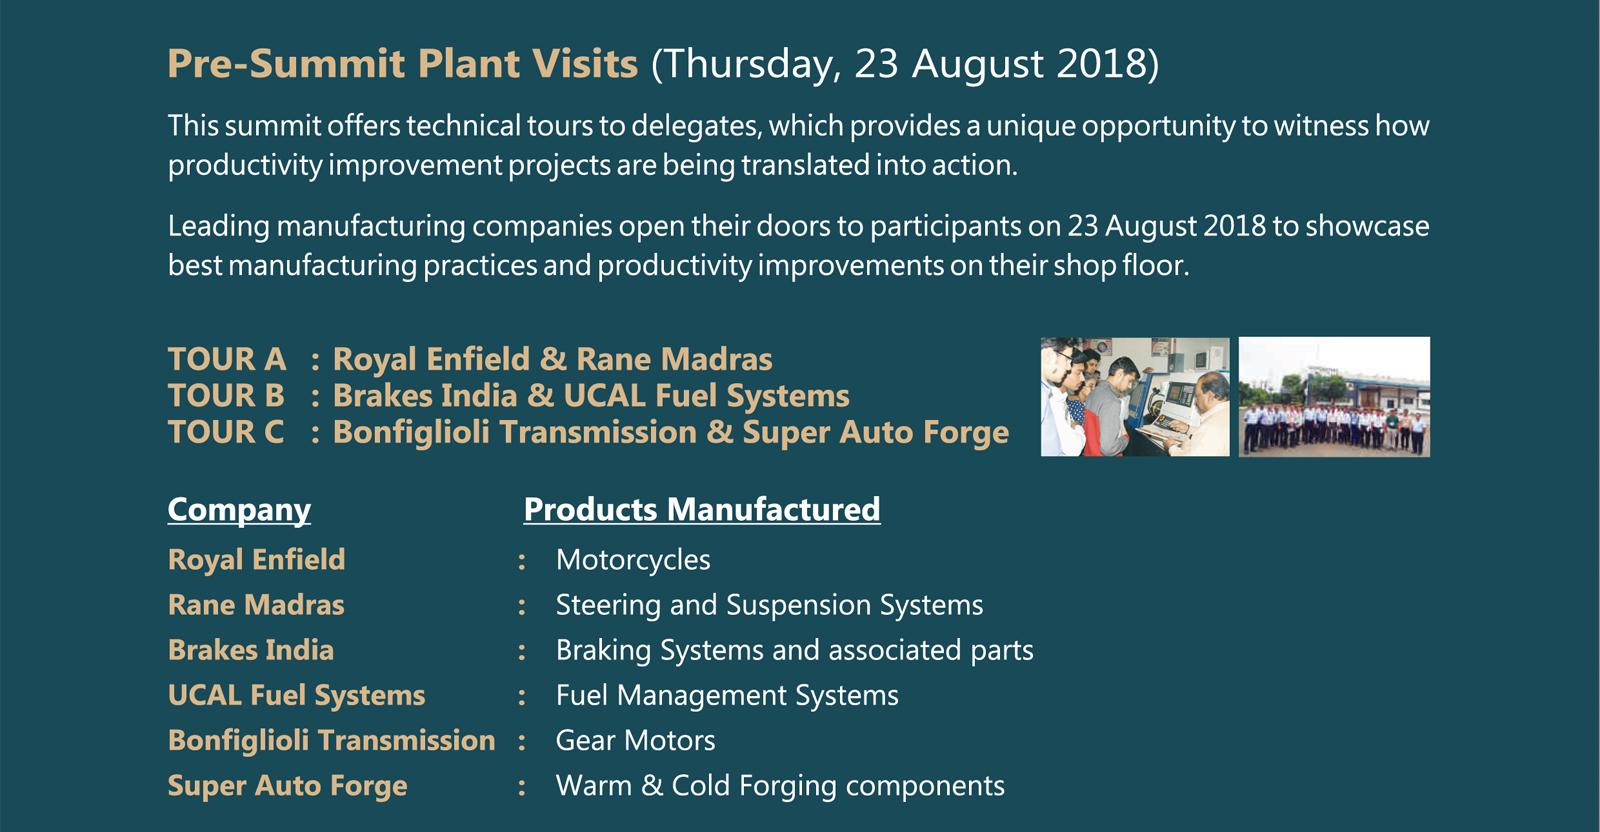 Pre-Summit-Plant-Visits